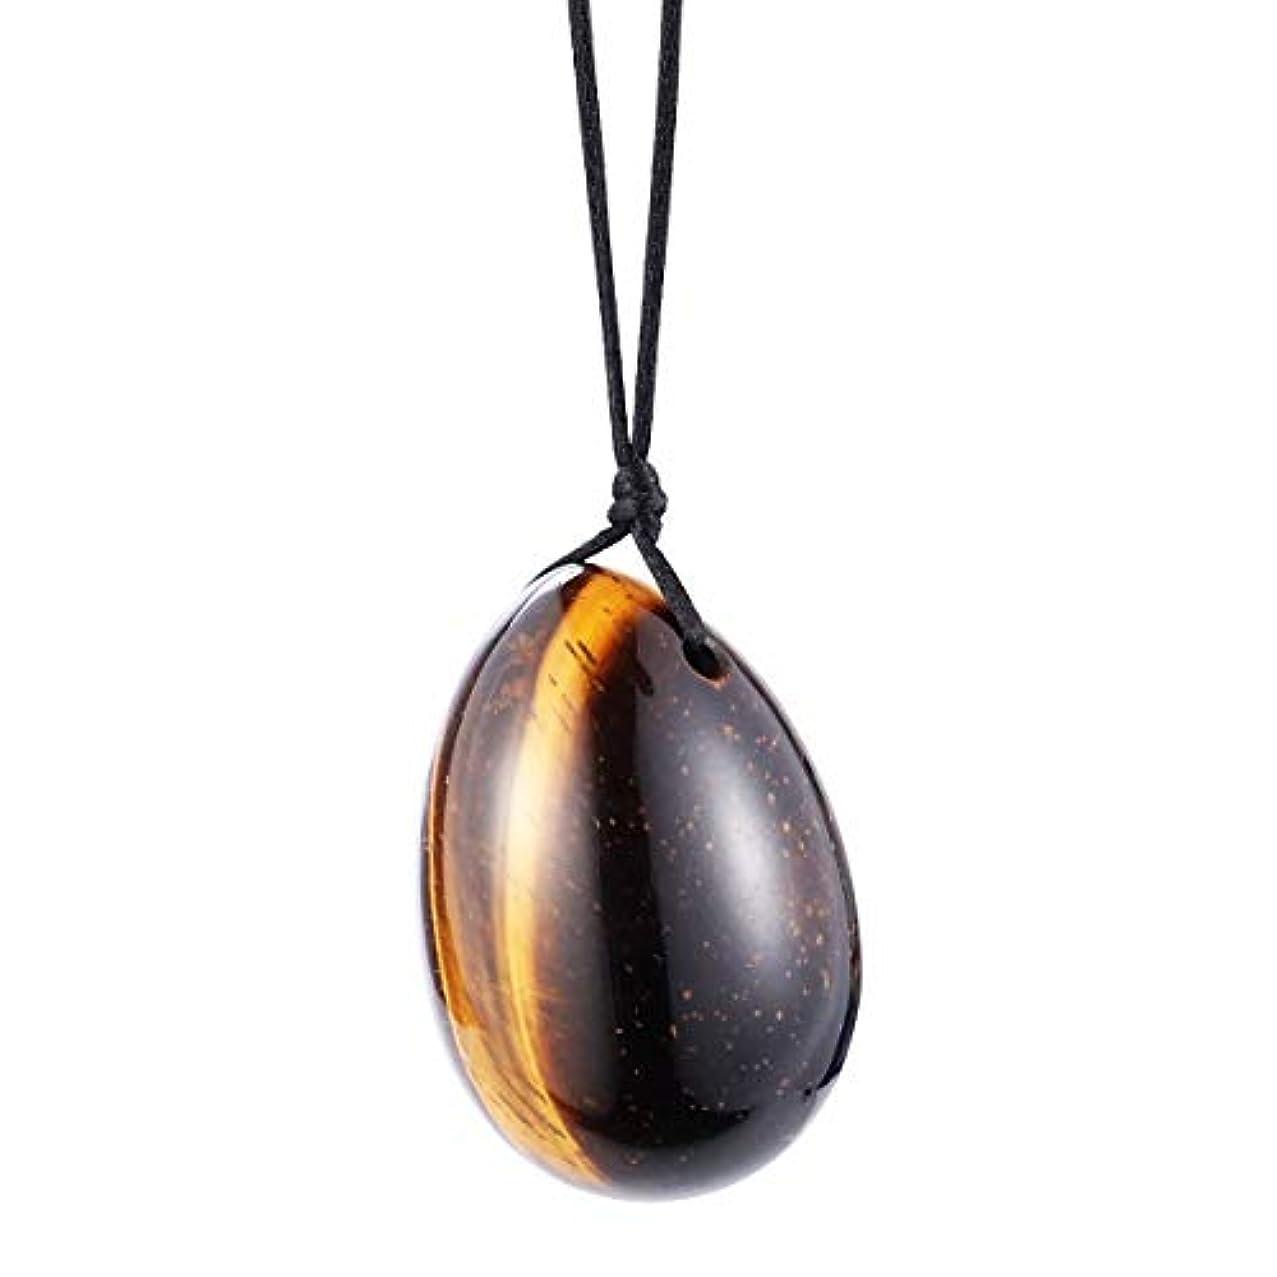 Healifty 1ピース玉ヨニ卵ドリルマッサージ石卵ケベル運動骨盤底筋膣運動ヘルスケア